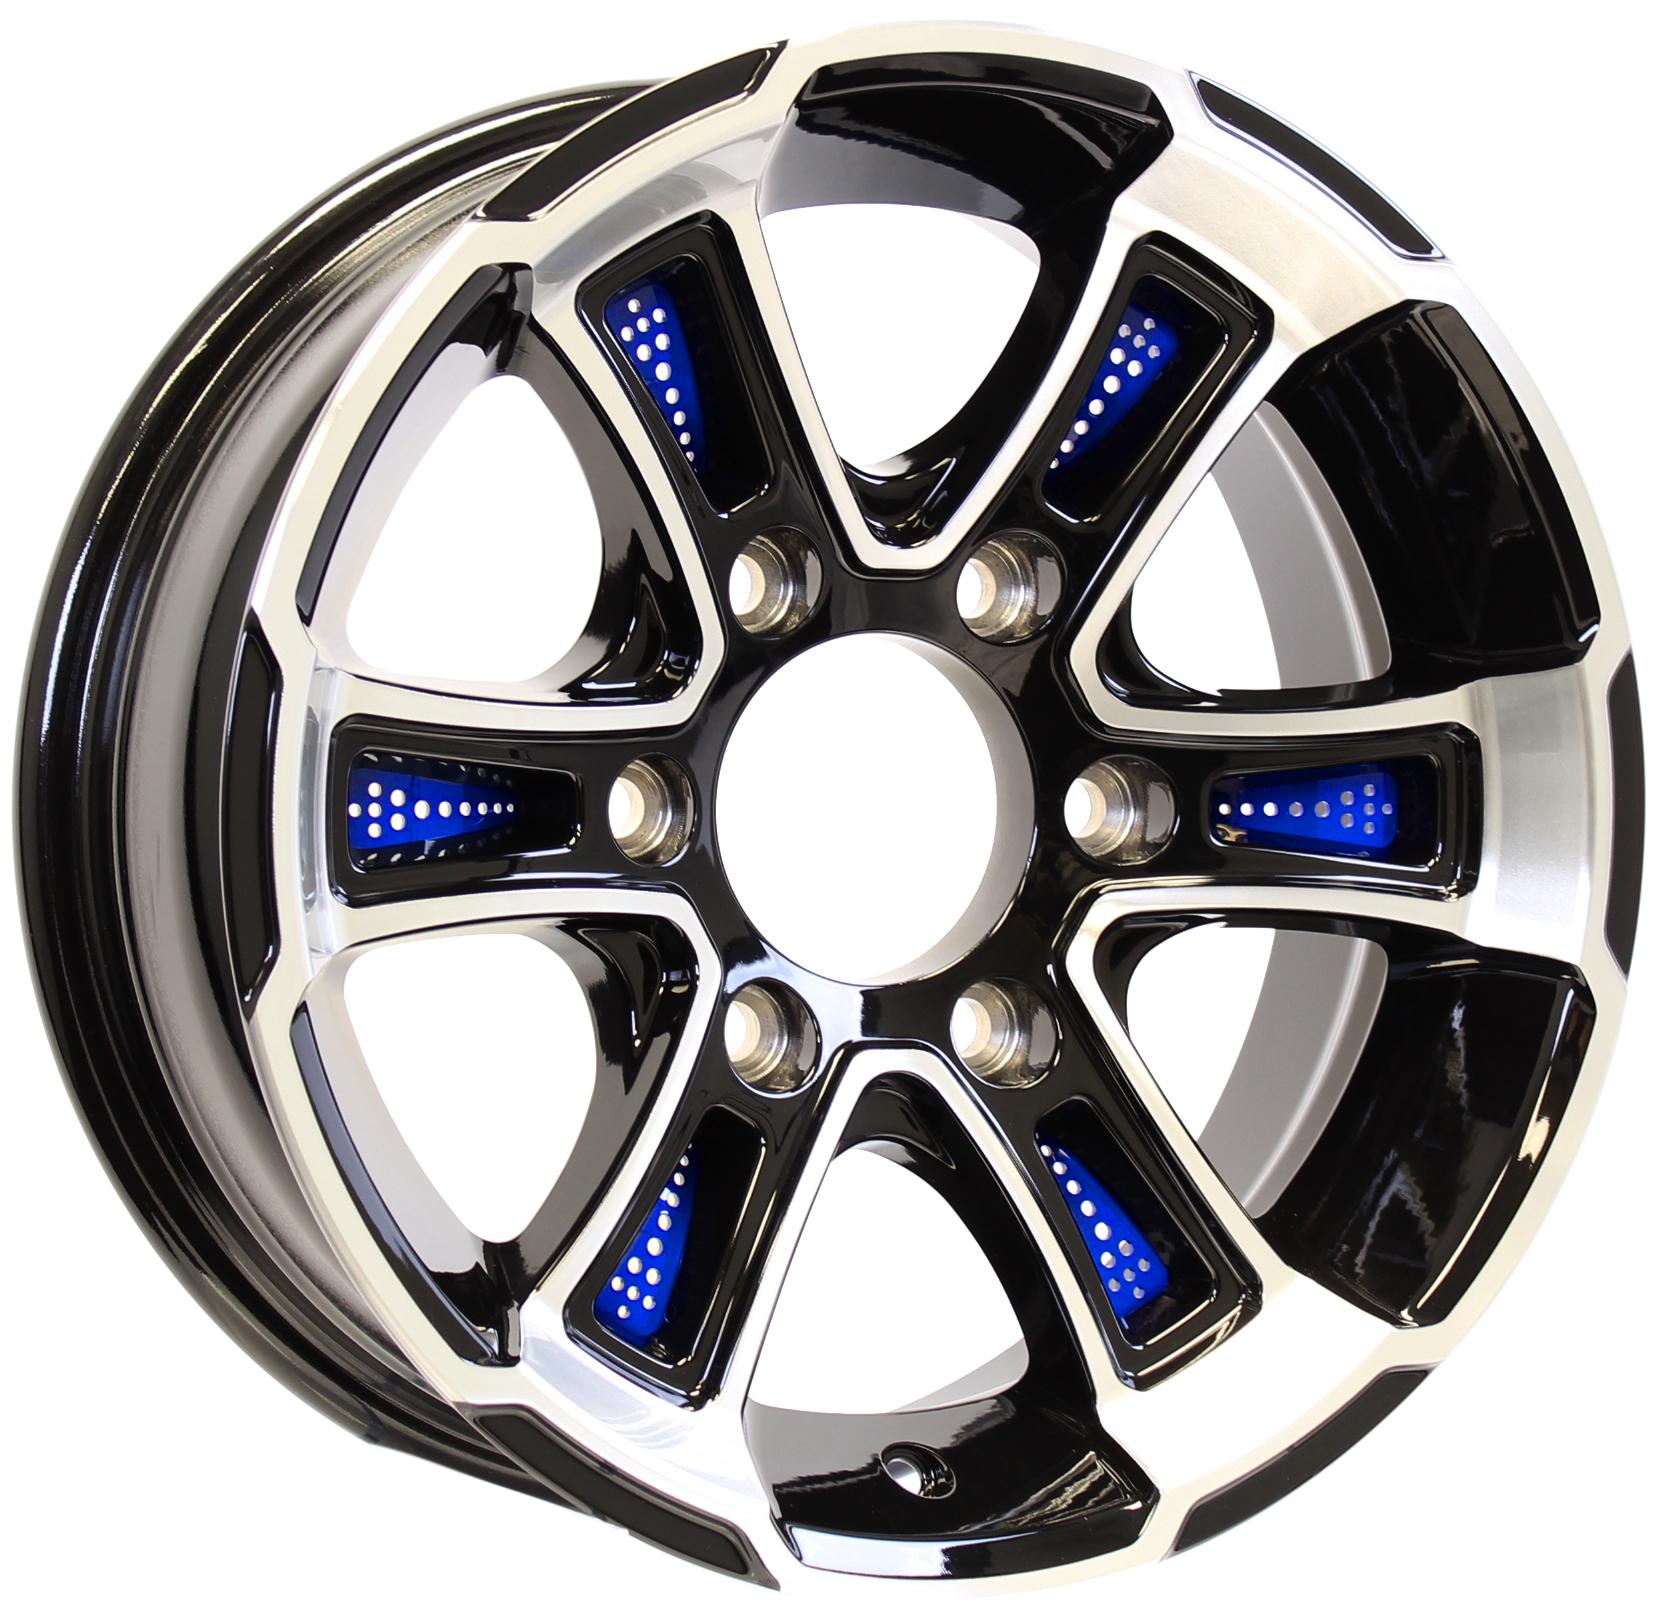 White Hawk 15x6 6-5.5 Black Aluminum Trailer Wheel with Blue Inserts Image